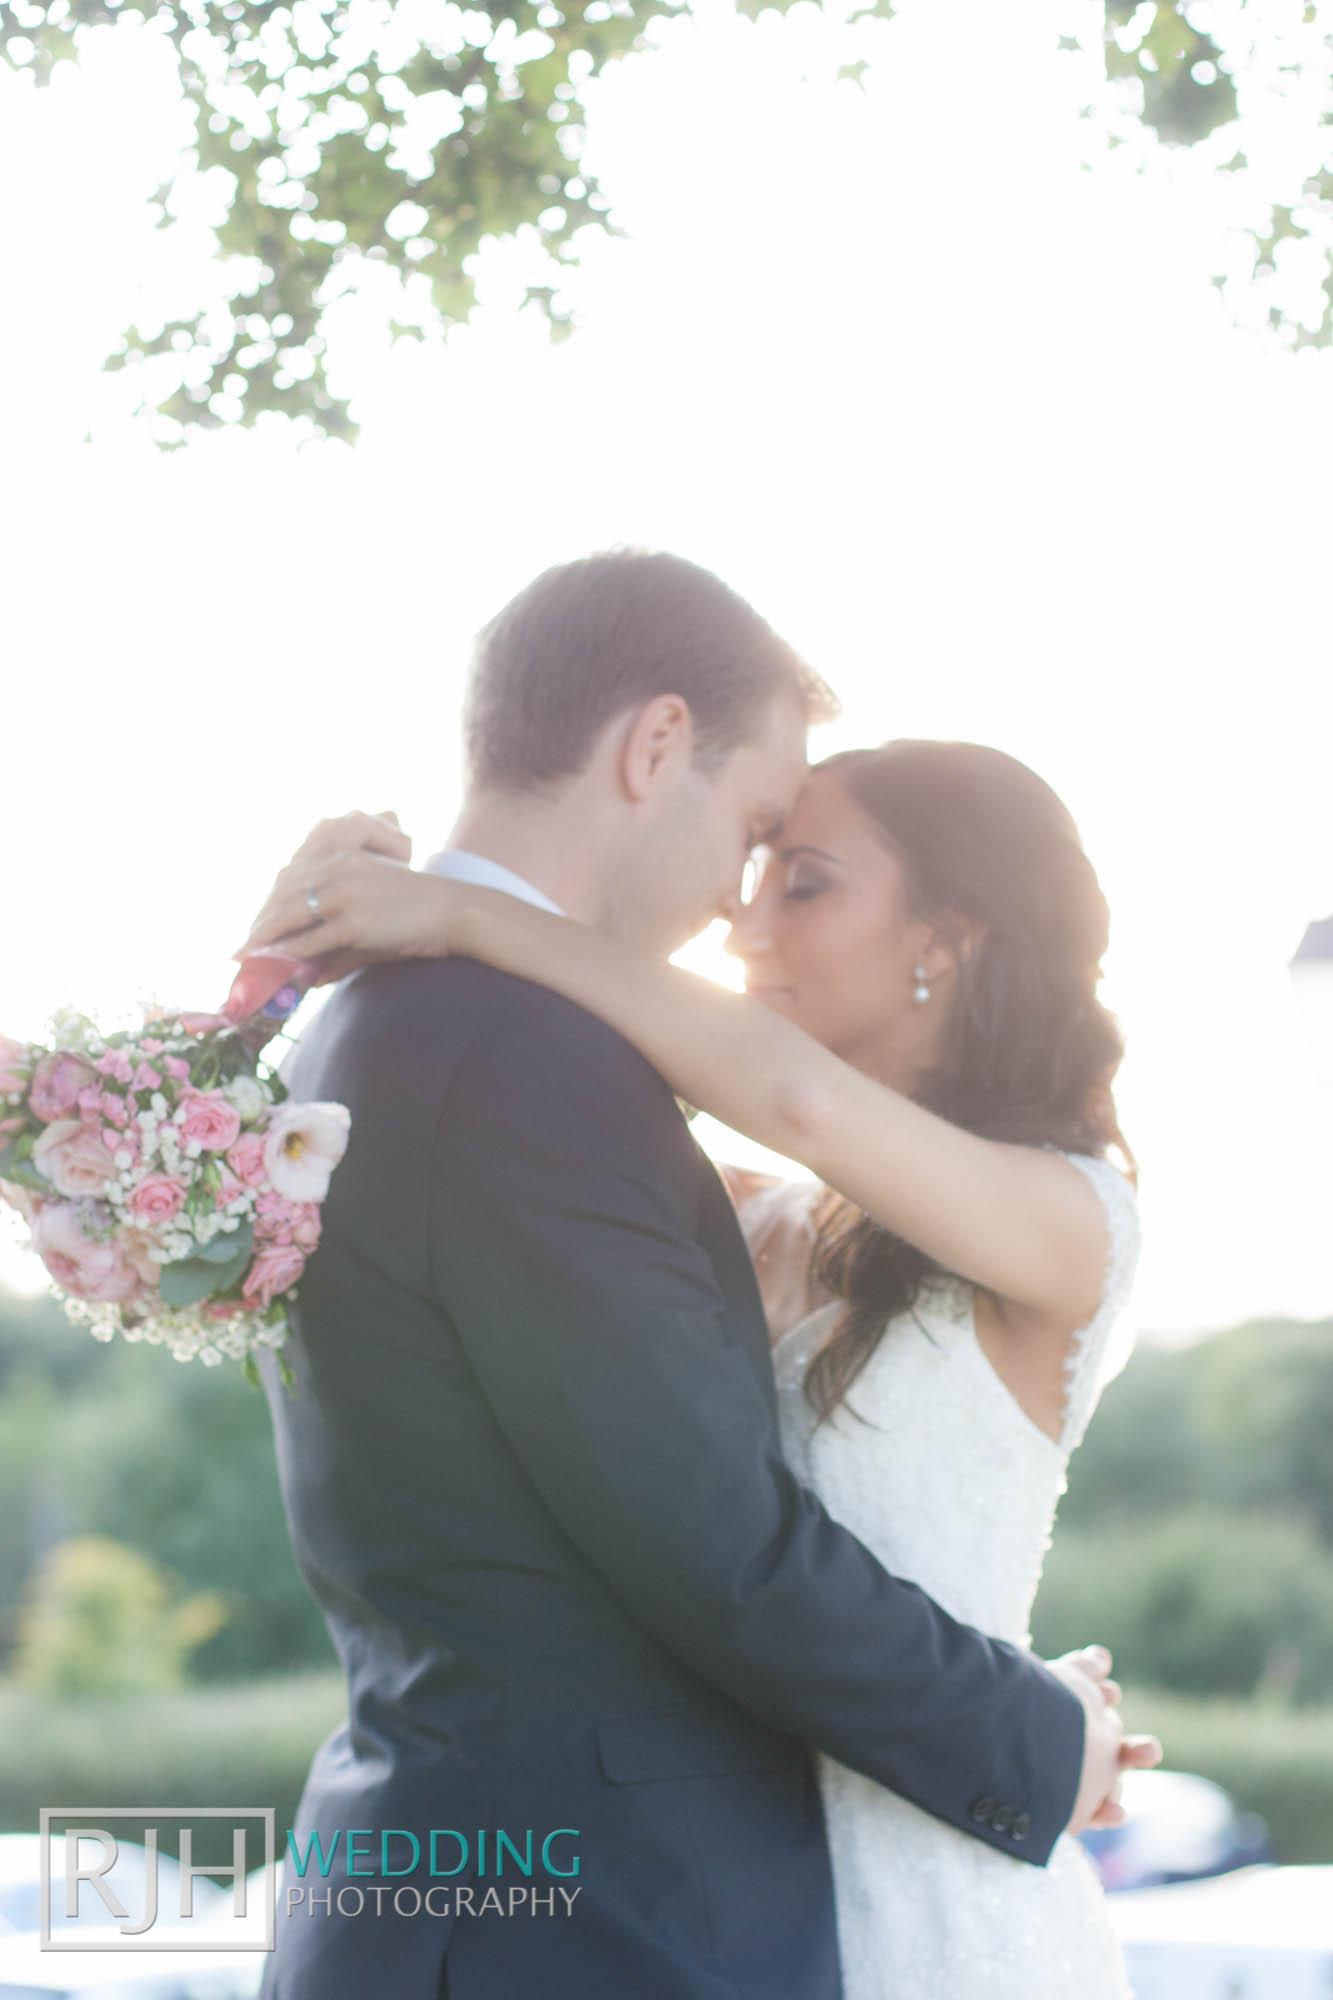 RJH Wedding Photography_Tankersley Manor Wedding_42.jpg